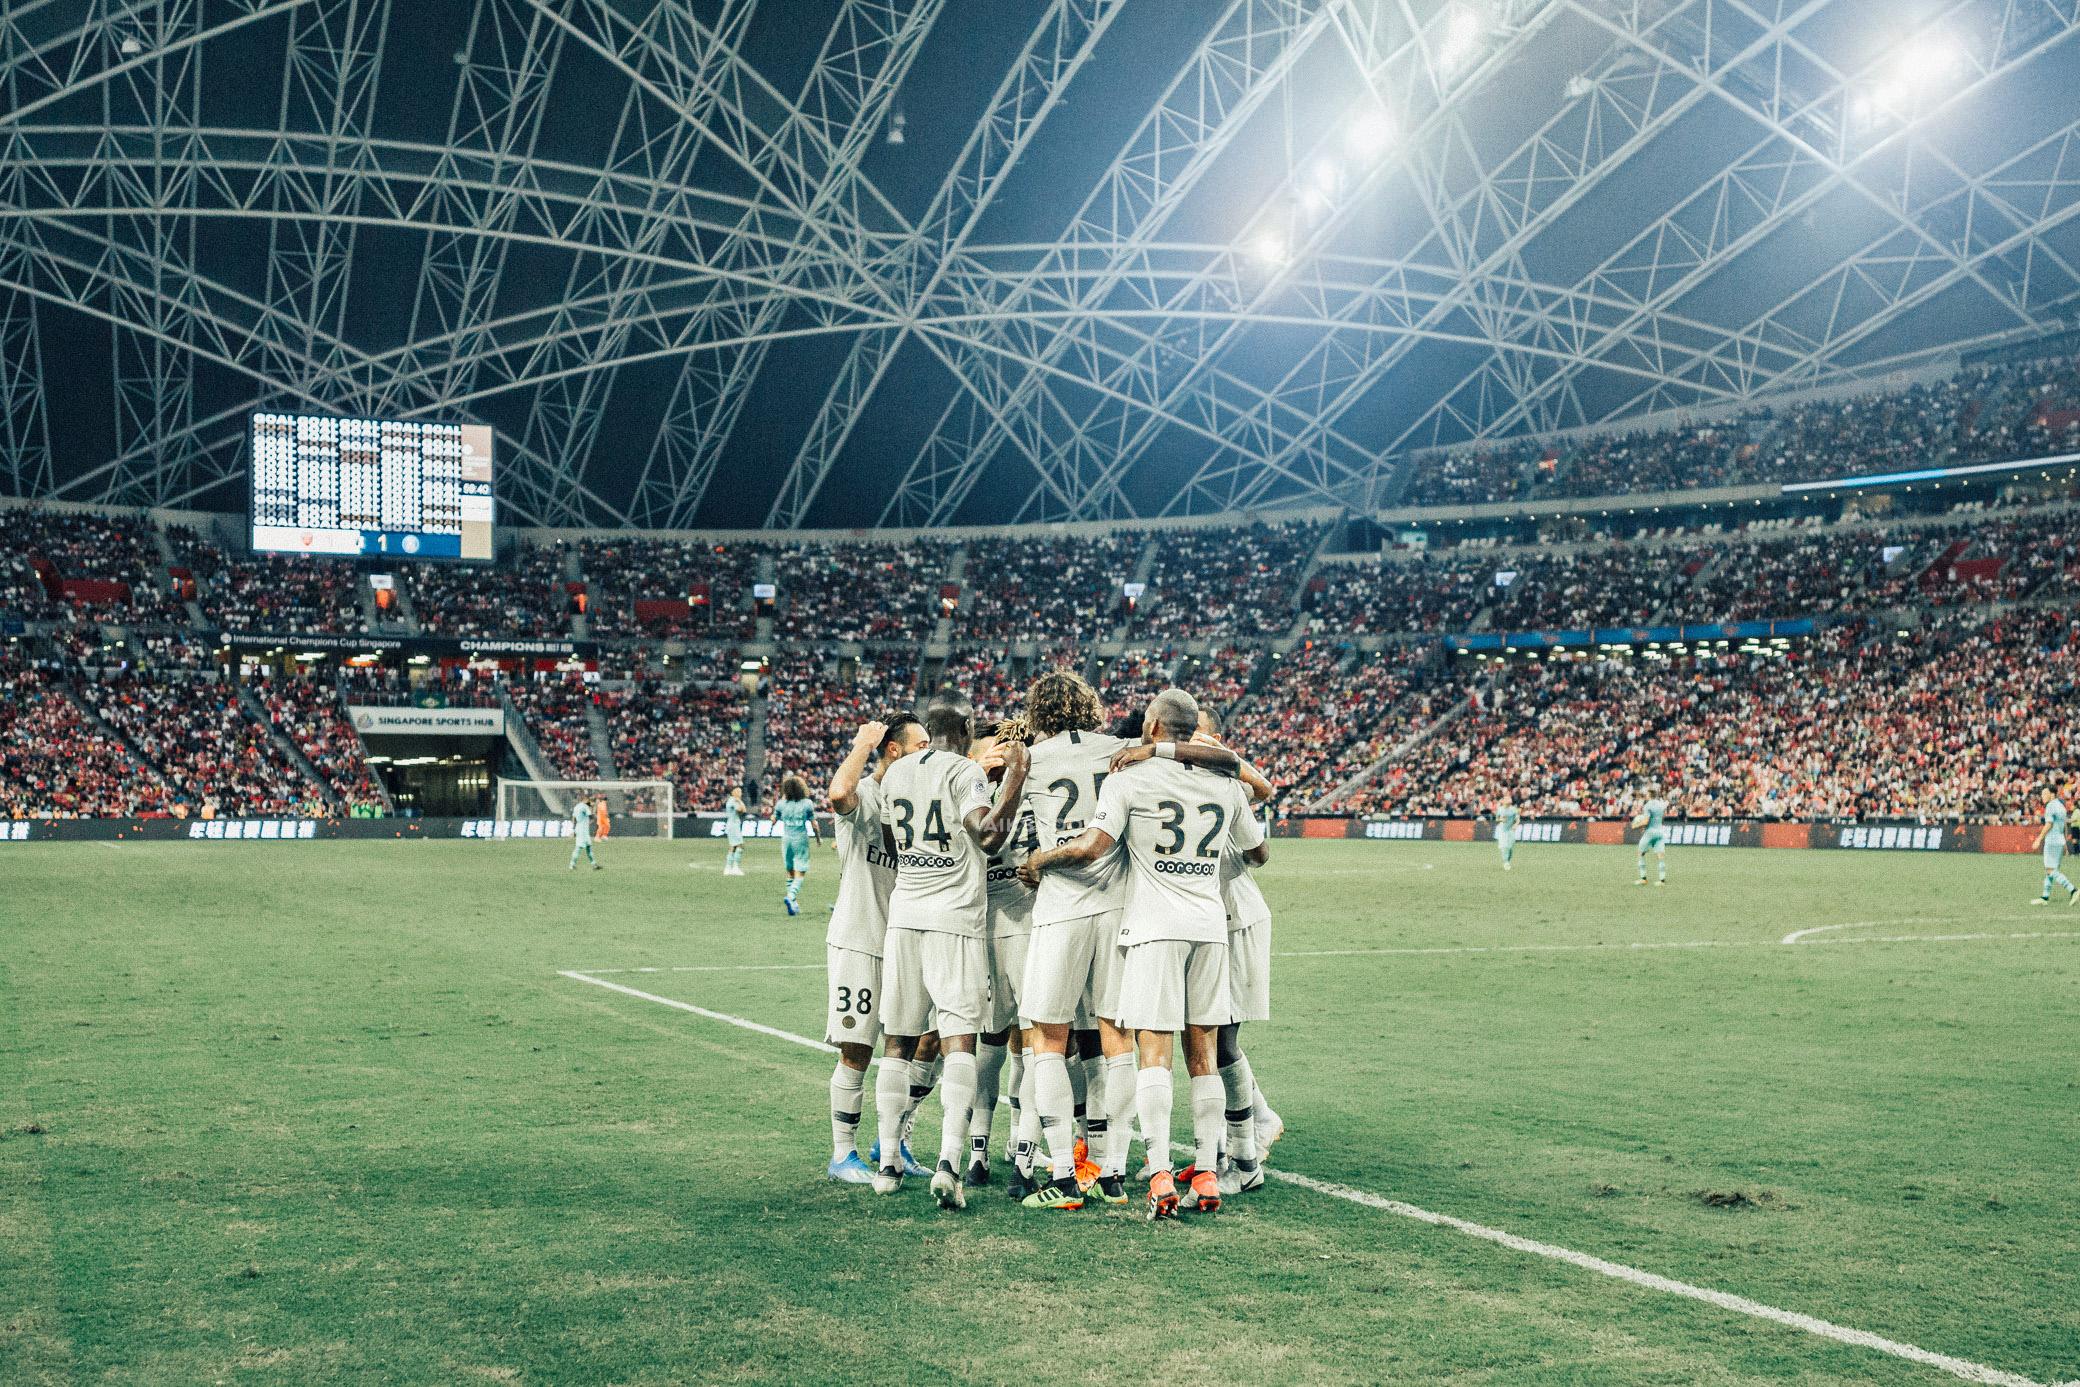 ICC 2018: PSG VS ARSENAL